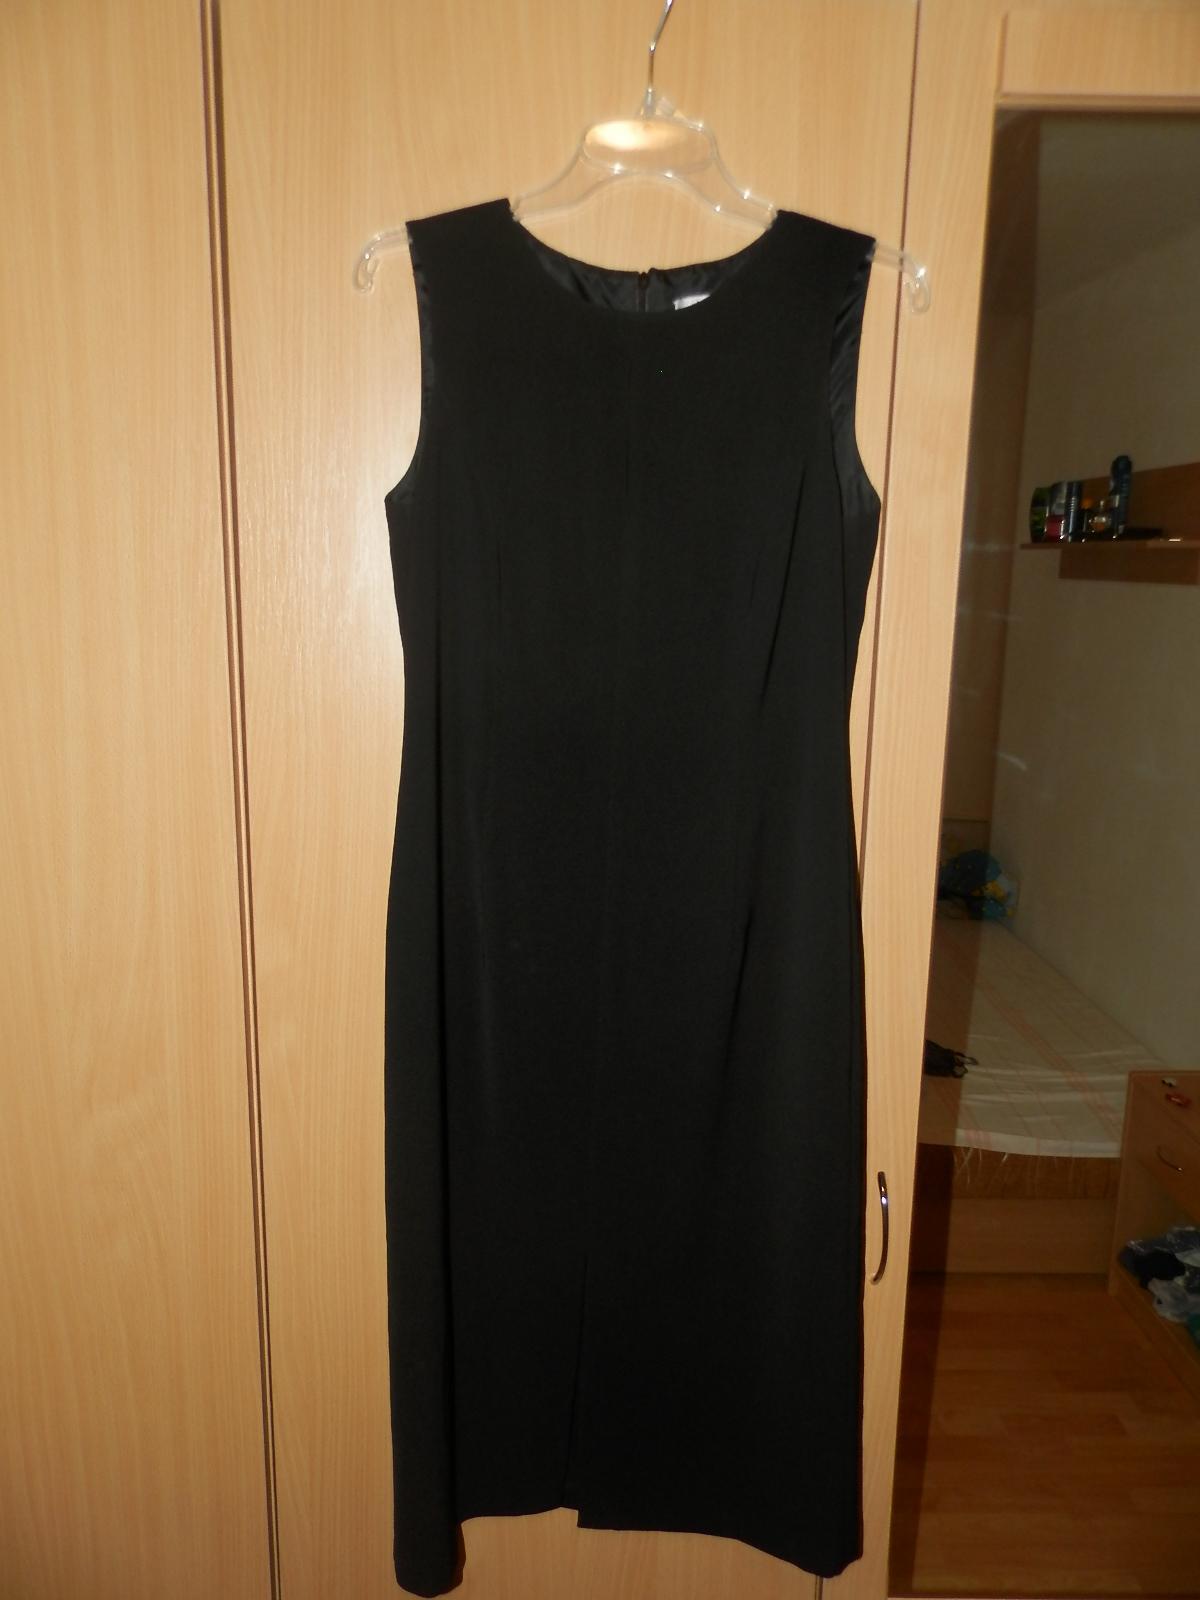 J.TAYLOR elegantné šaty M/L - Obrázok č. 2